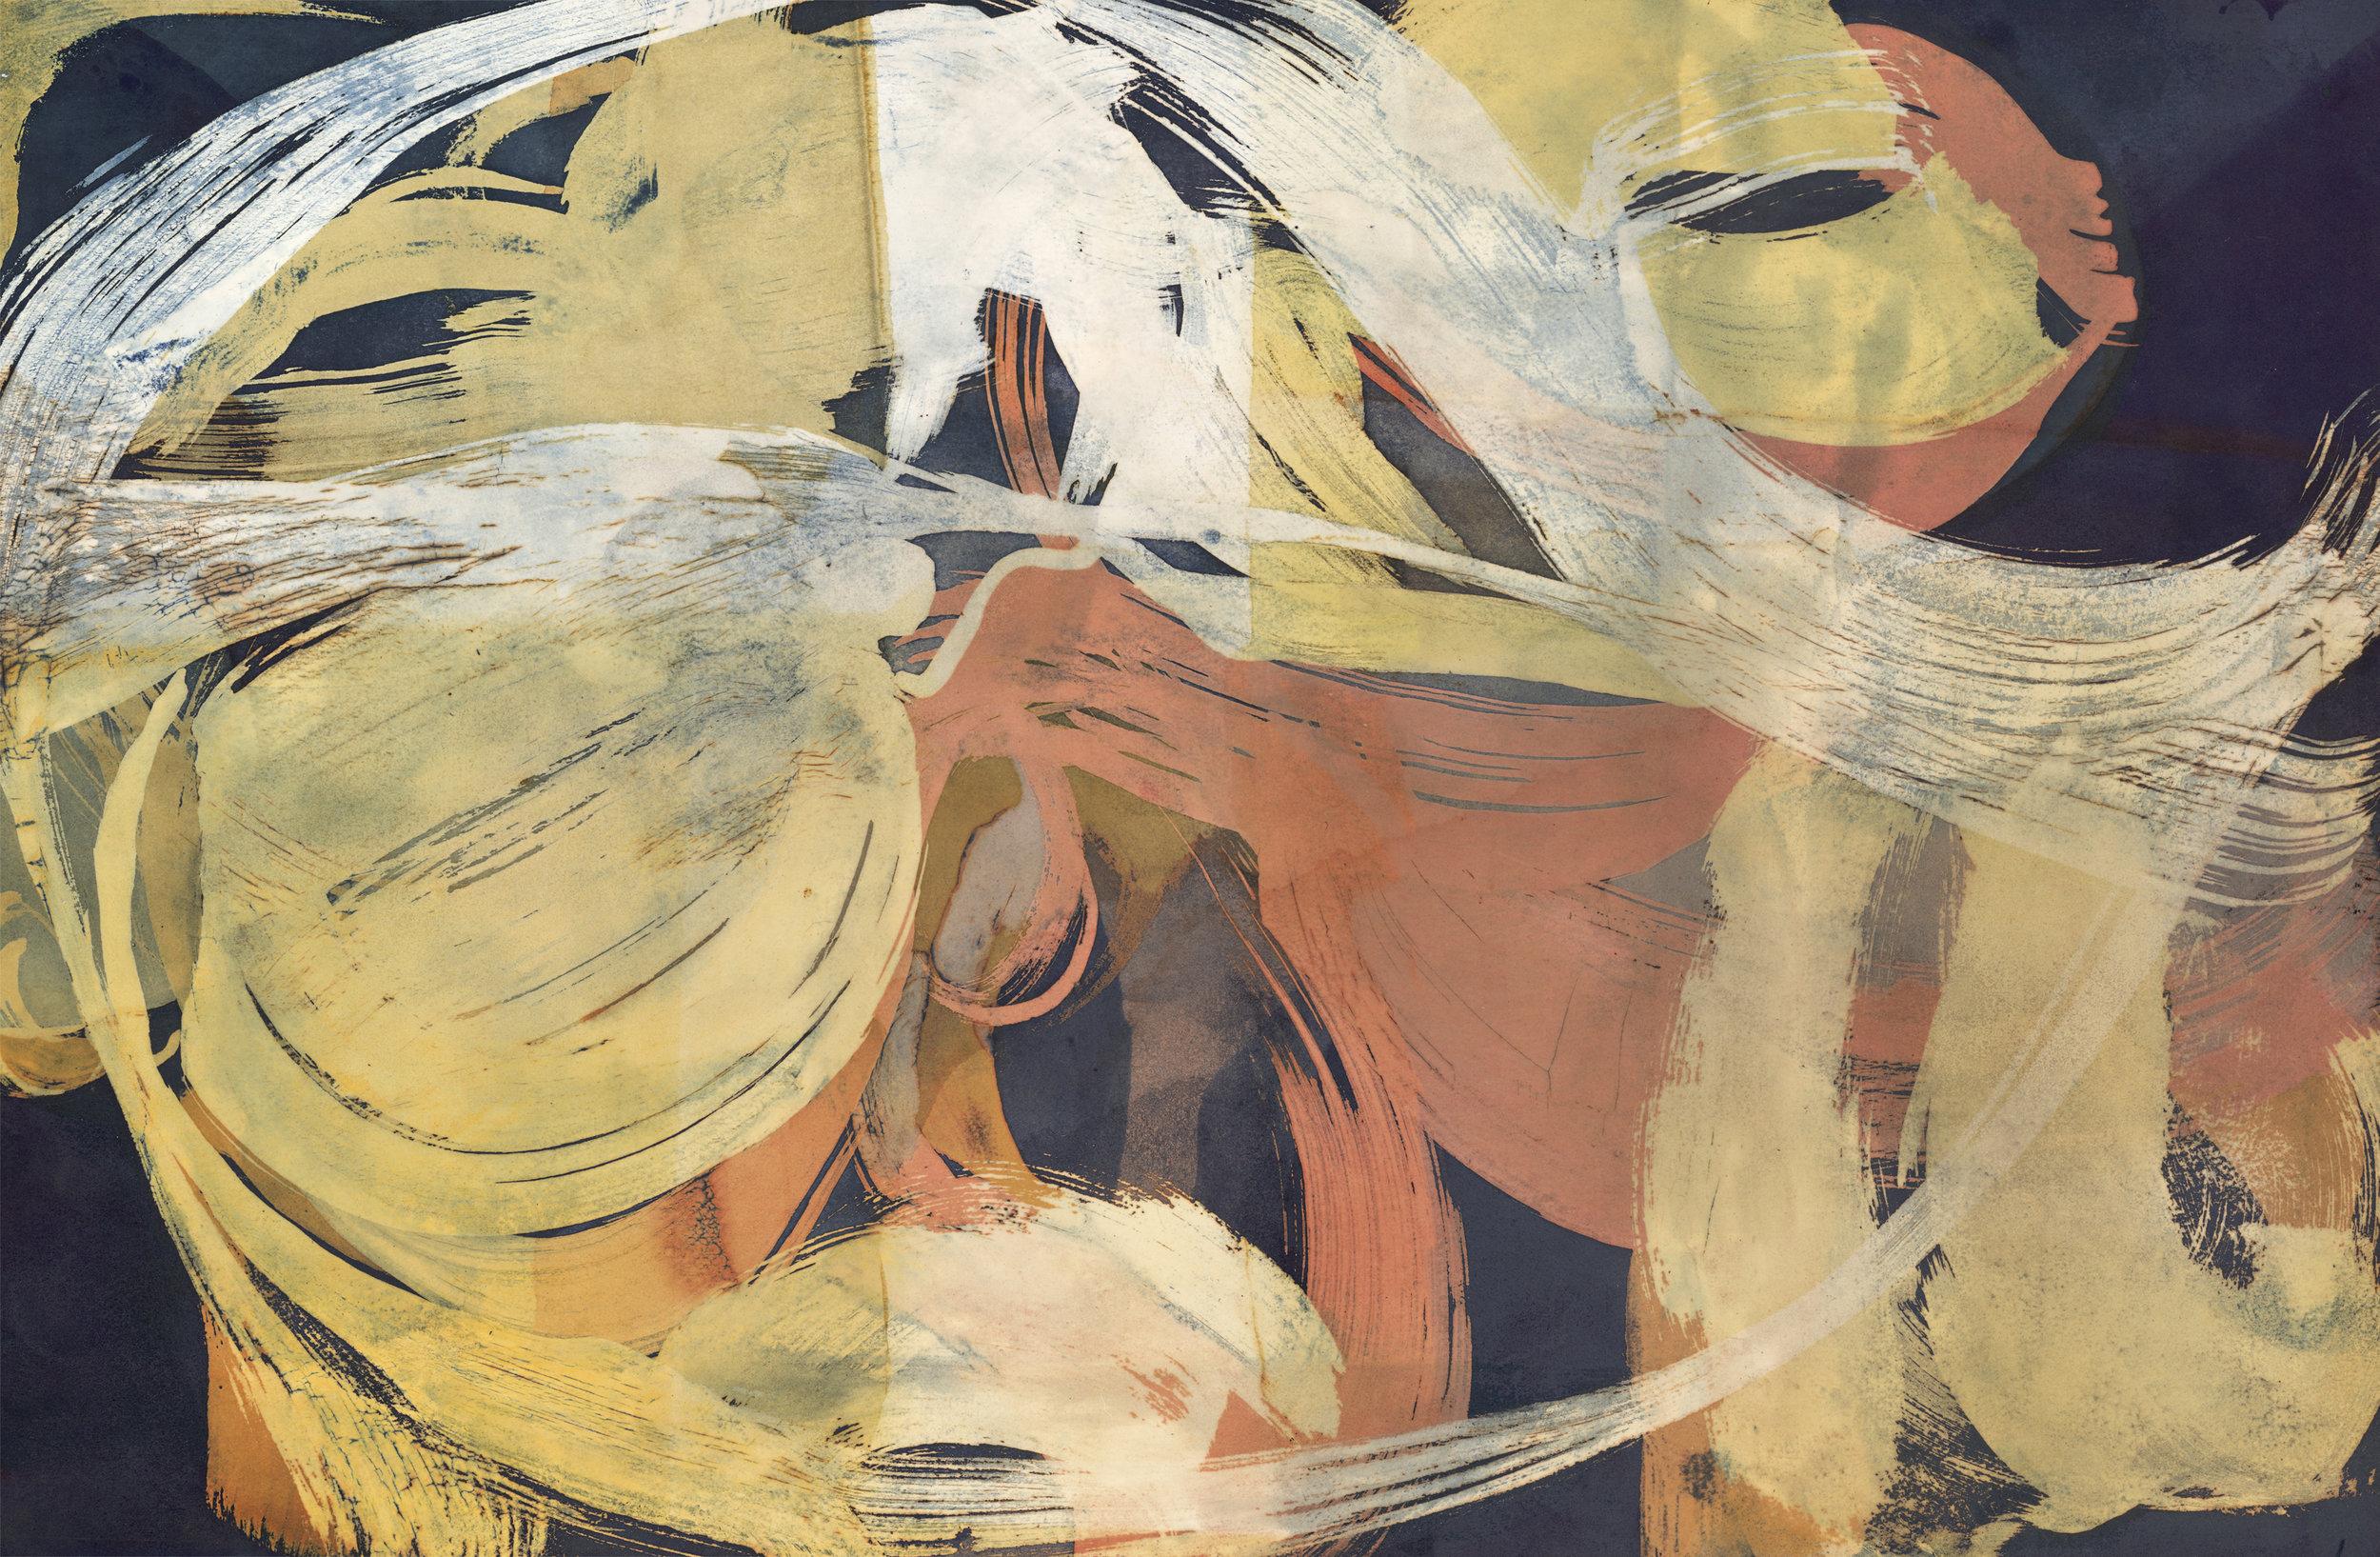 FLORAL DANCE ED-1  Click on image to order samples.